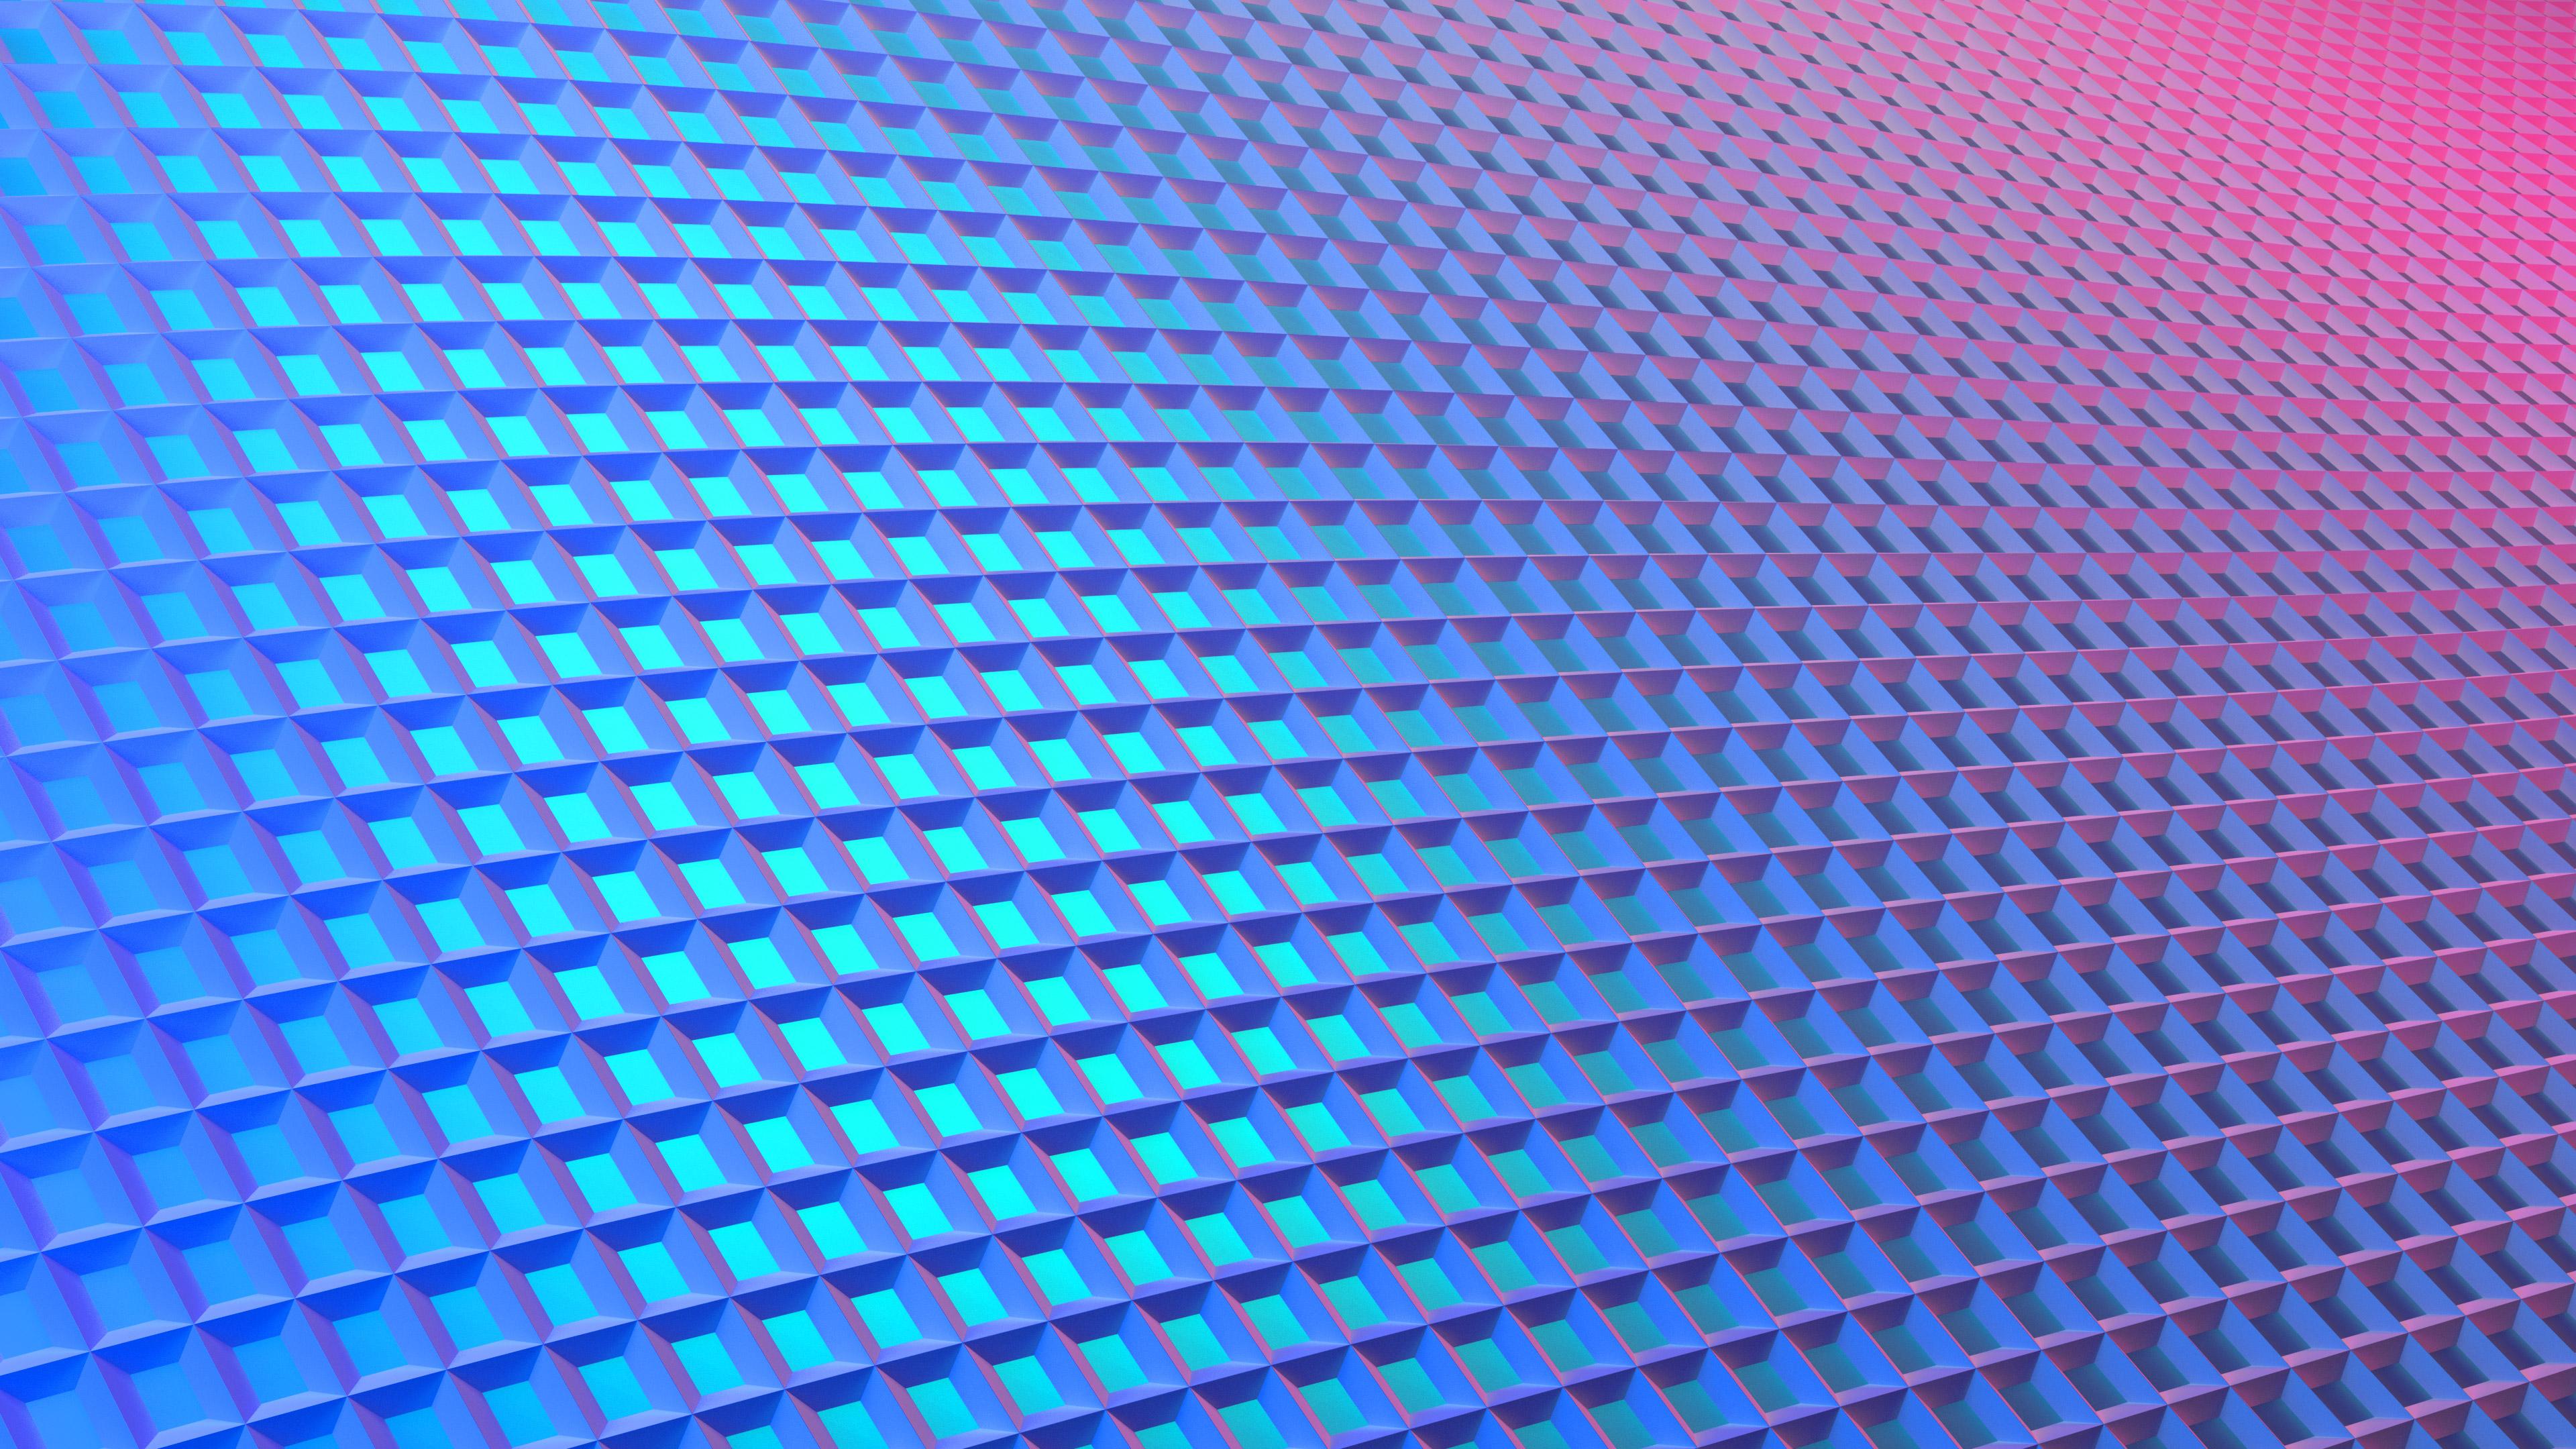 grids 1539370703 - Grids - hd-wallpapers, digital art wallpapers, asbtract wallpapers, artist wallpapers, 4k-wallpapers